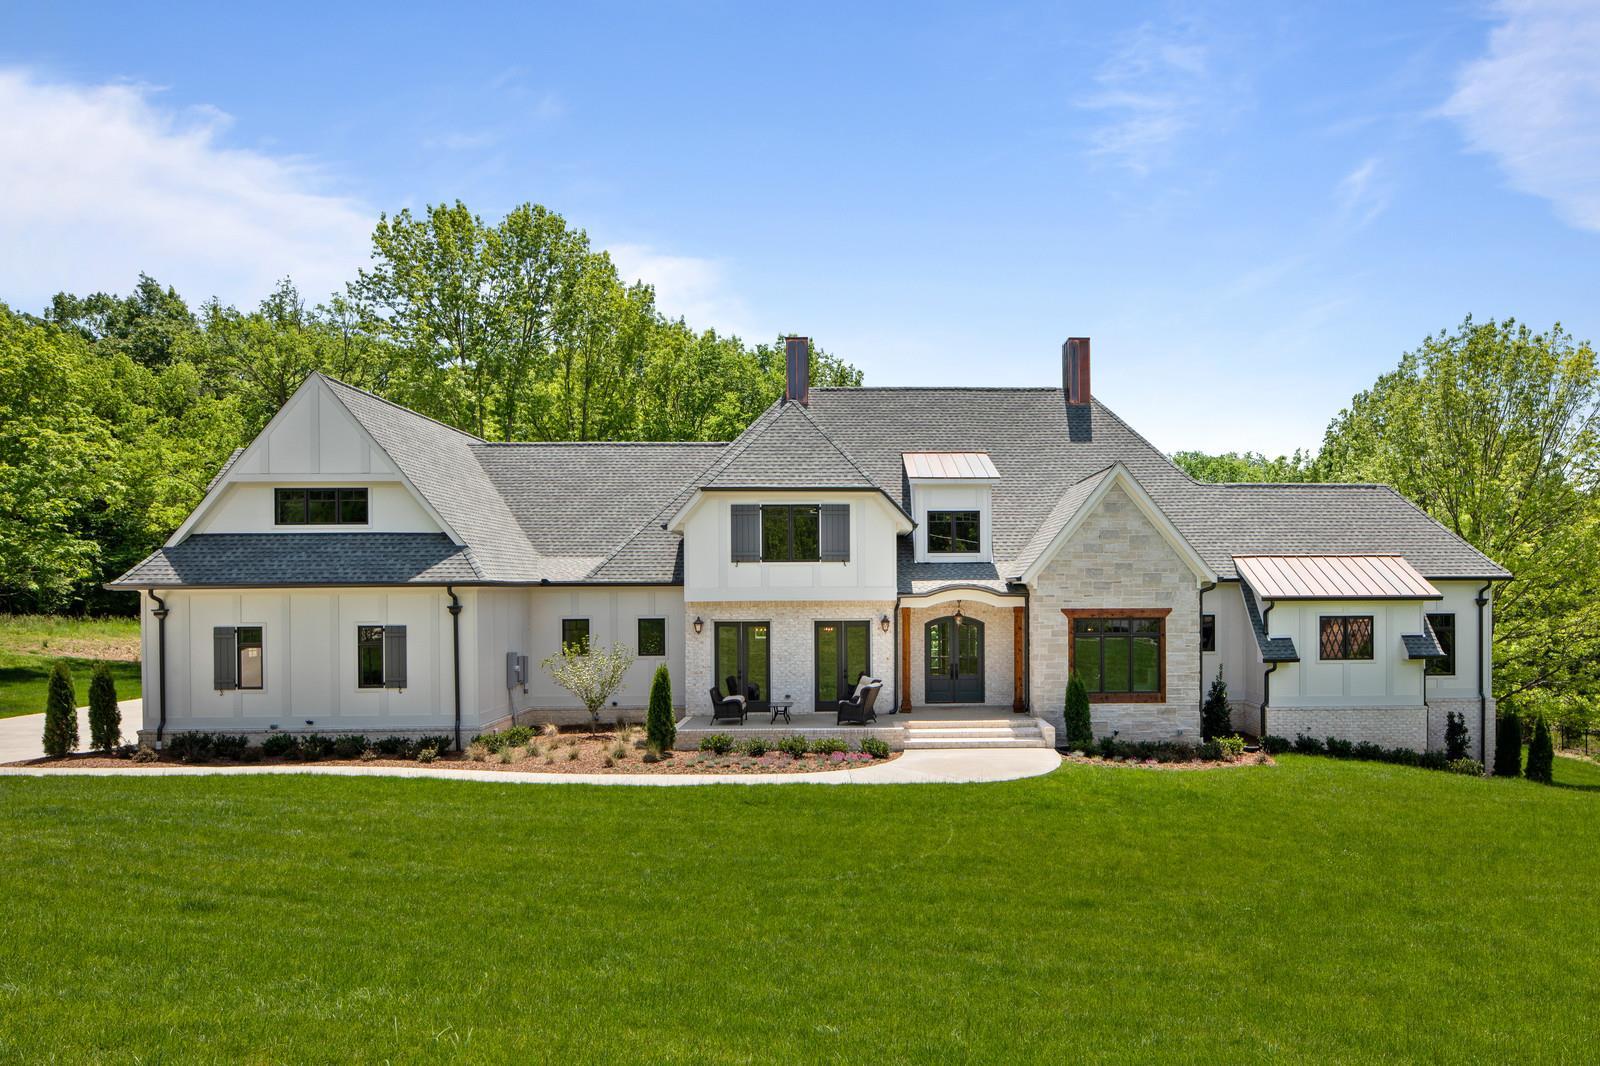 $2,699,000 - 5Br/5Ba -  for Sale in The Reserve At Radnor Lake, Nashville